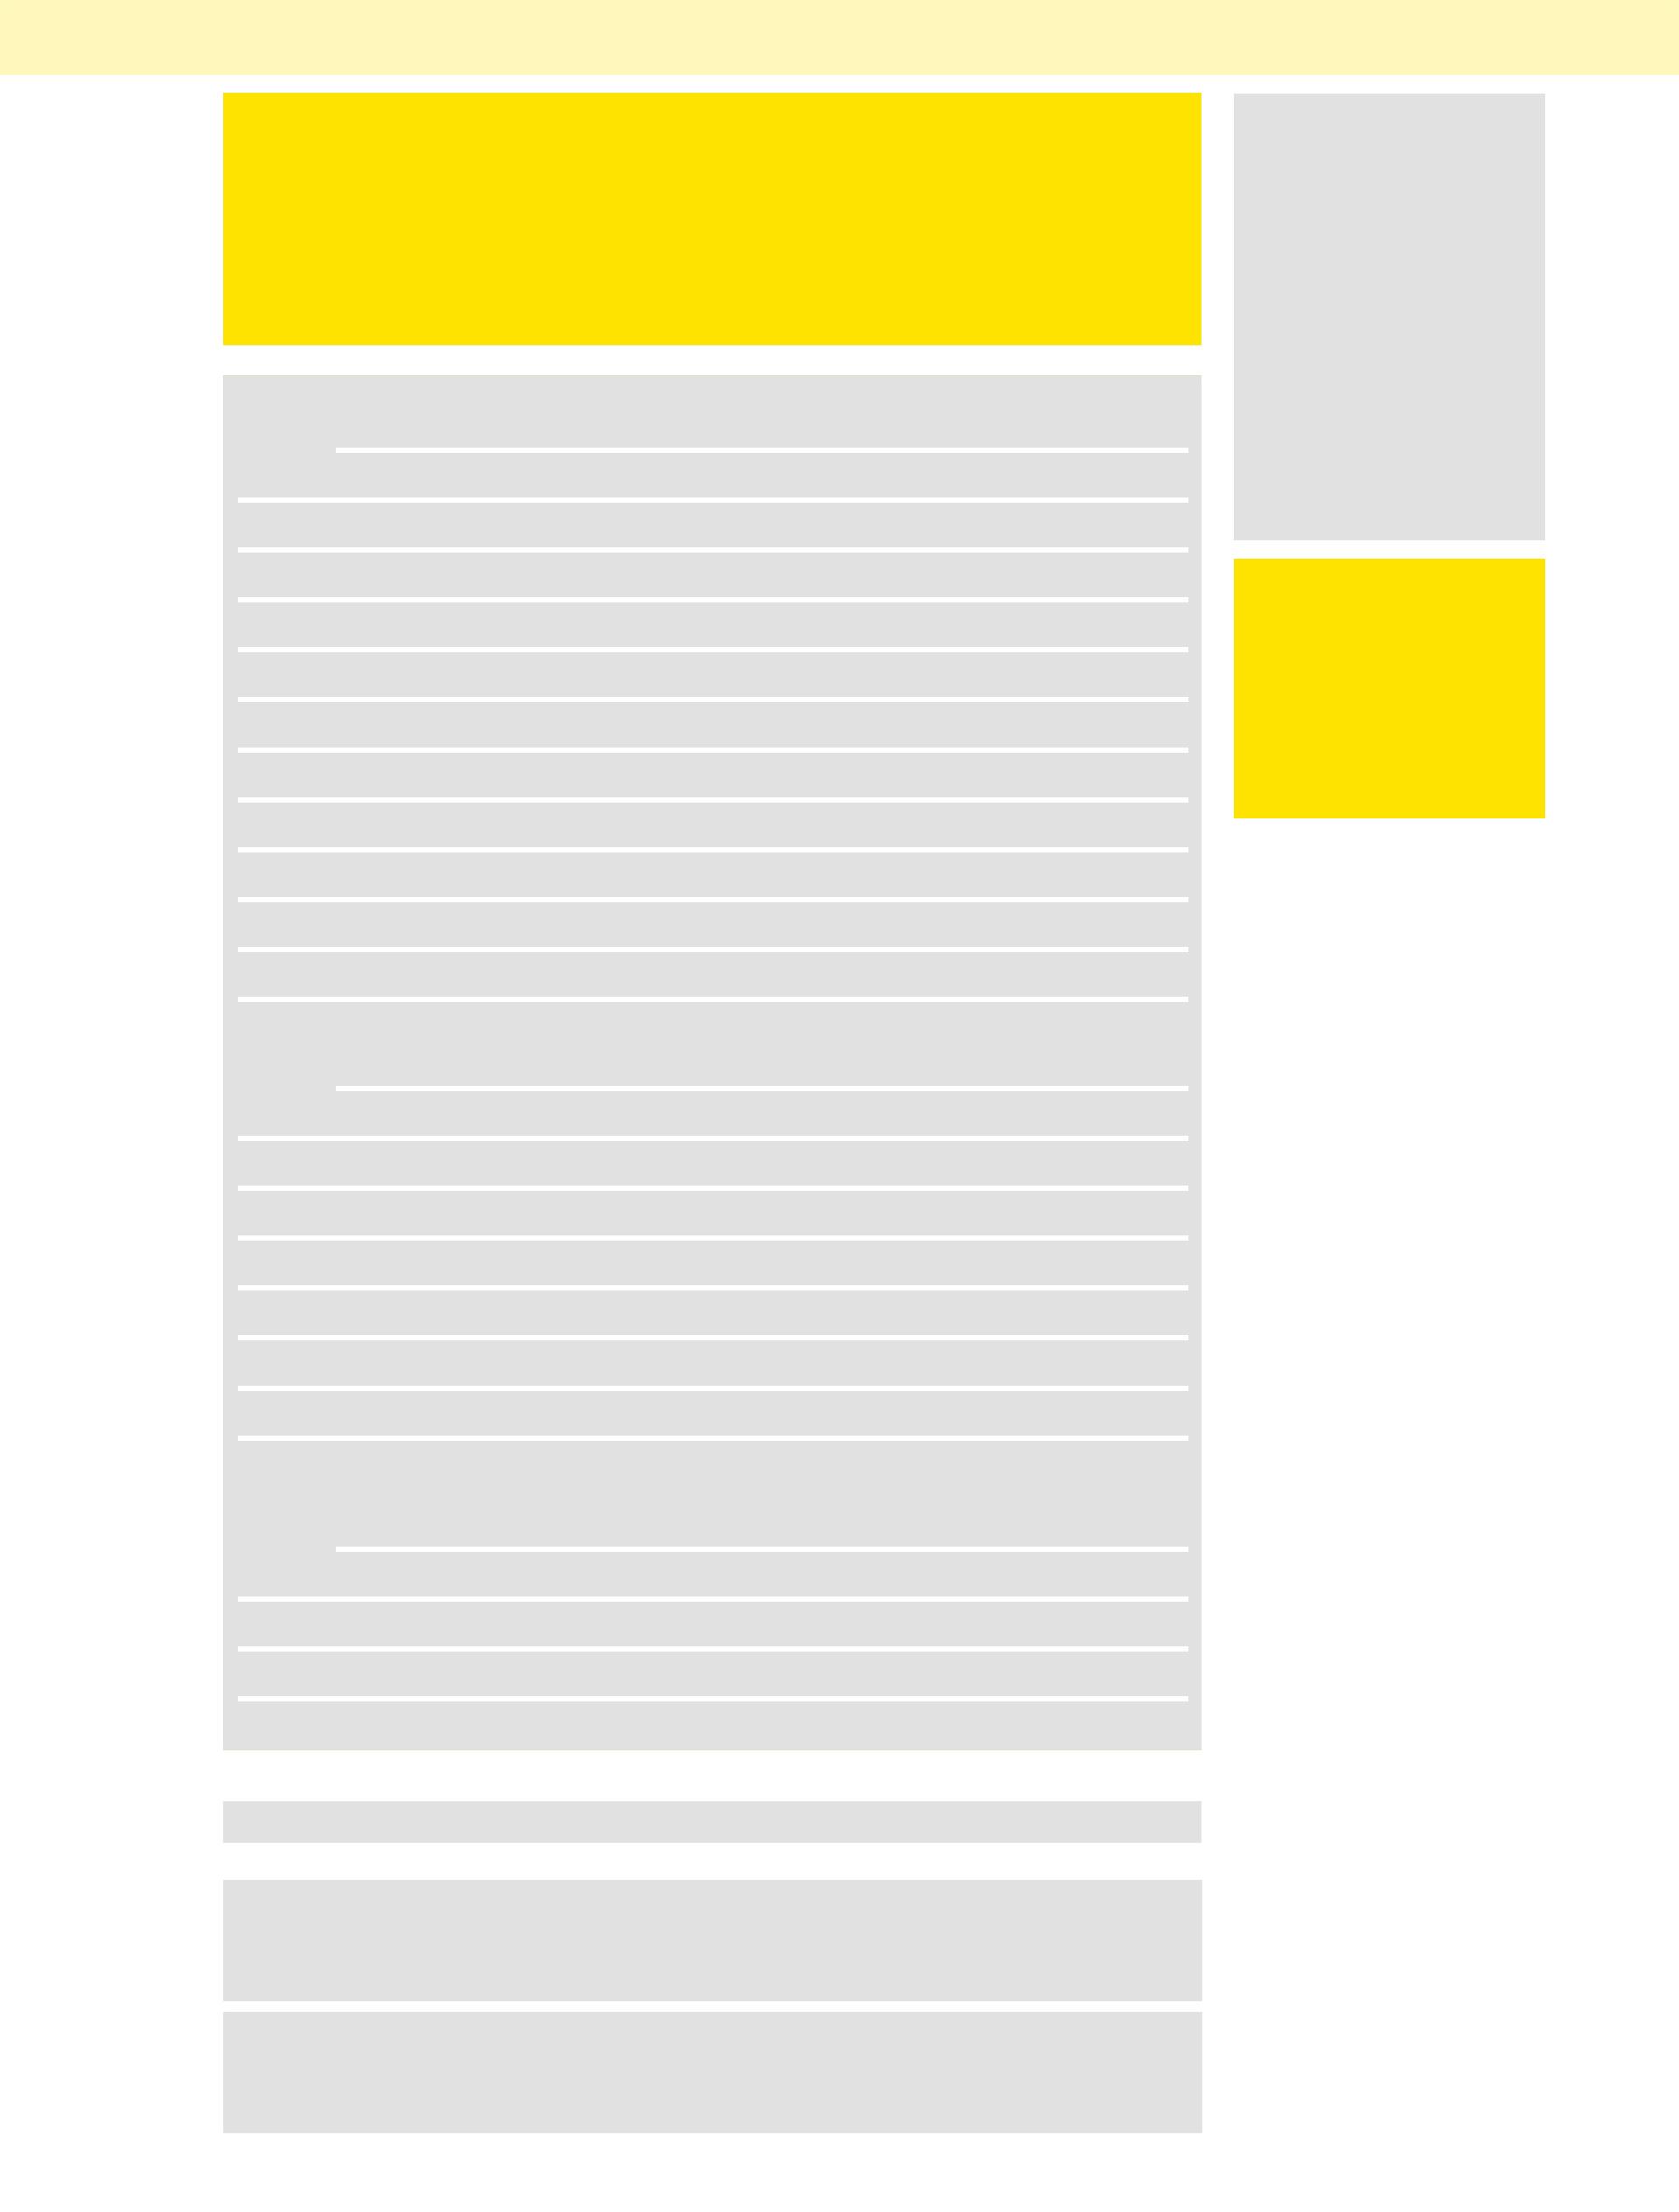 FITO Desktop Tall 06 26 20